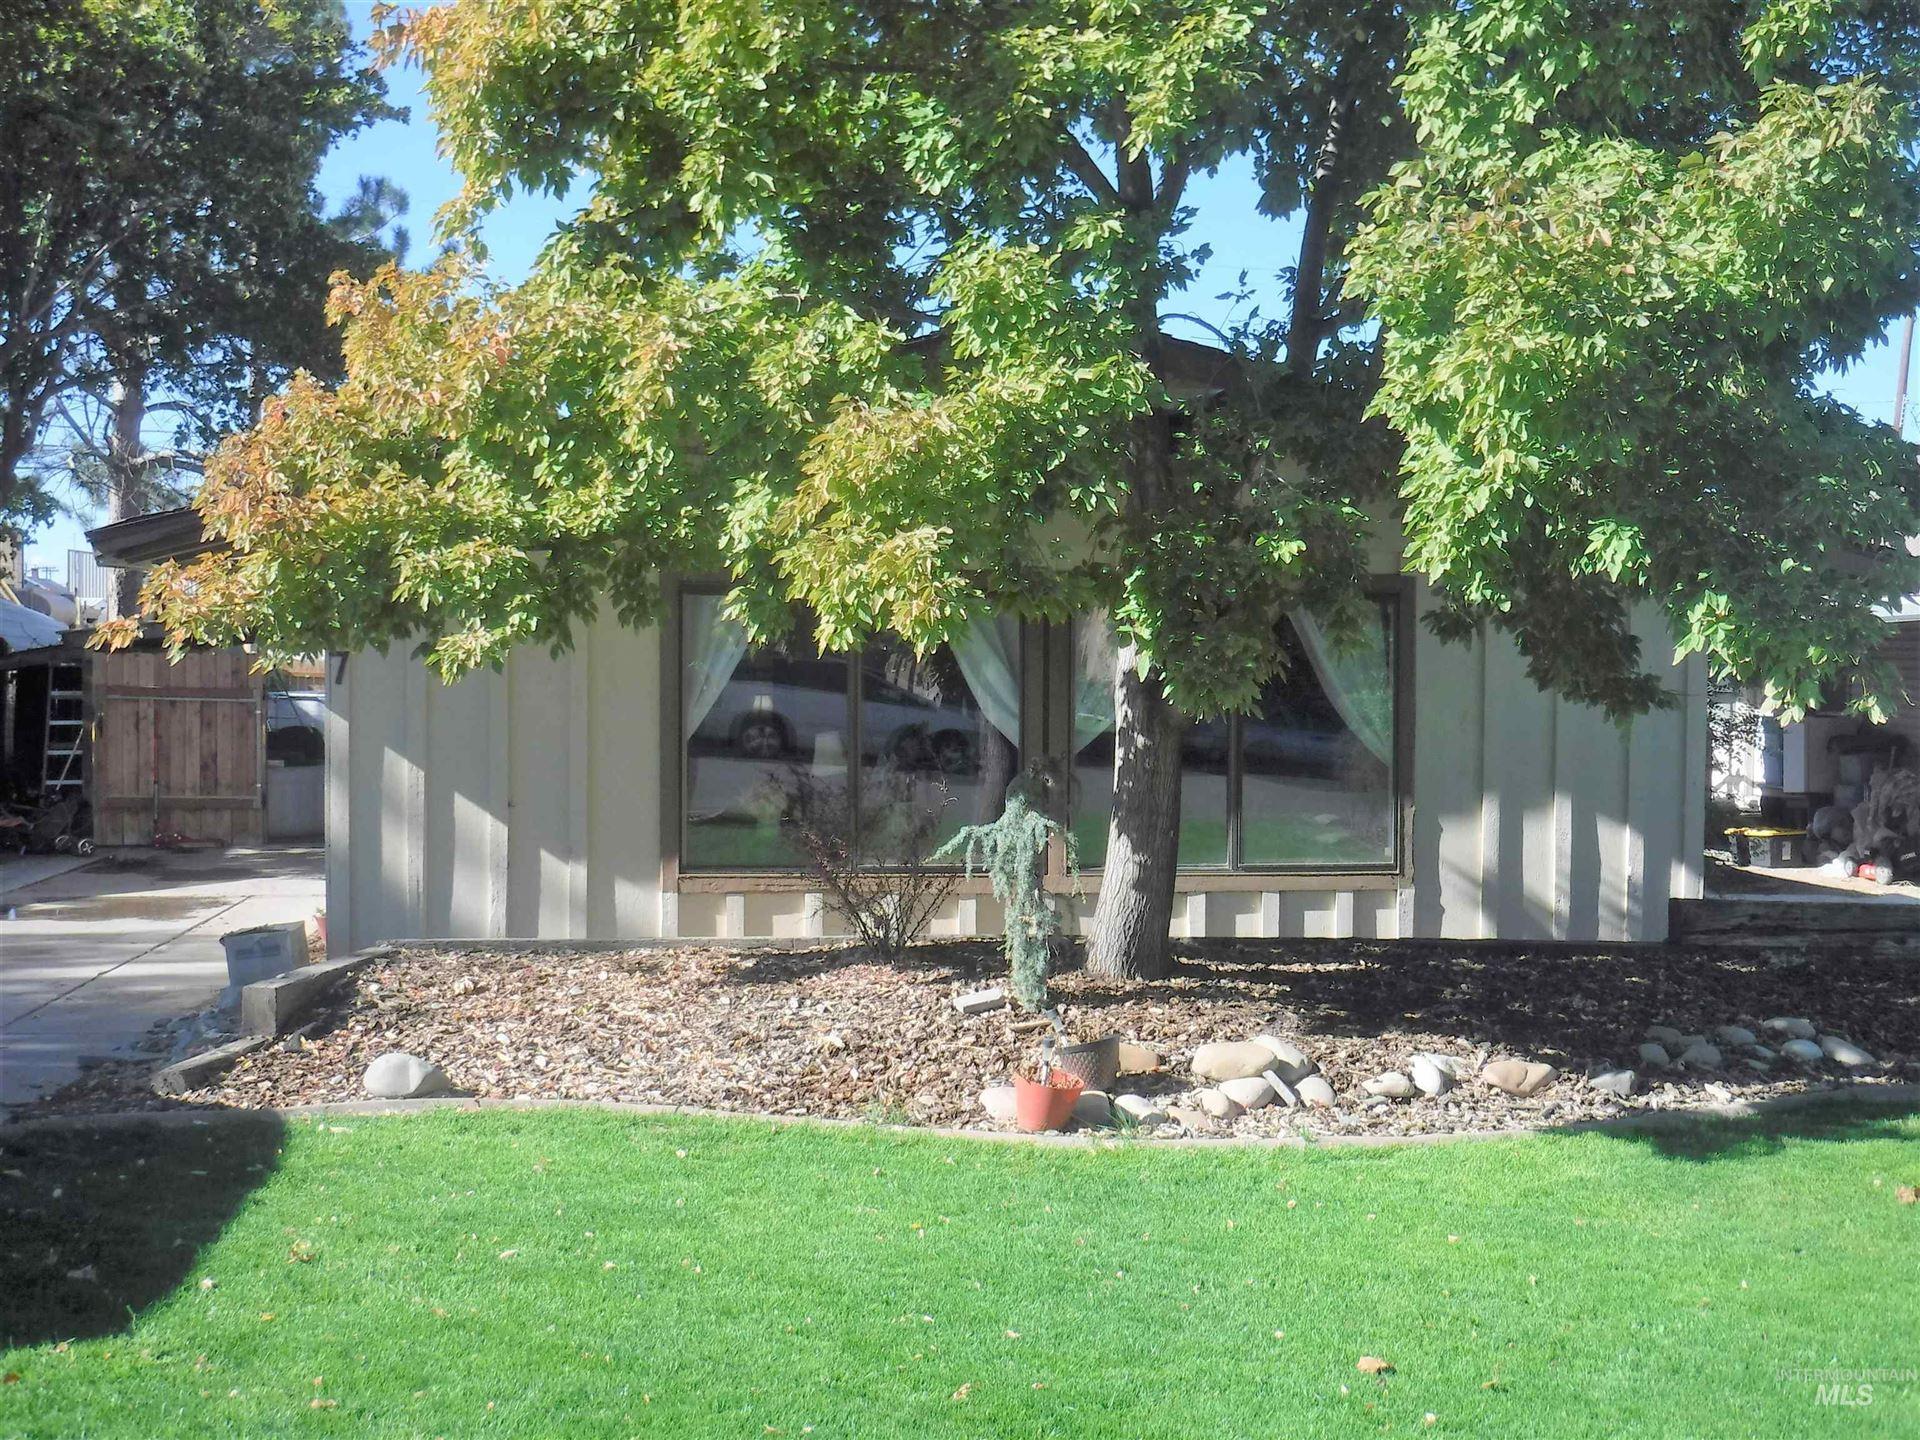 Photo of 117 14th Ave N, Buhl, ID 83316 (MLS # 98819330)